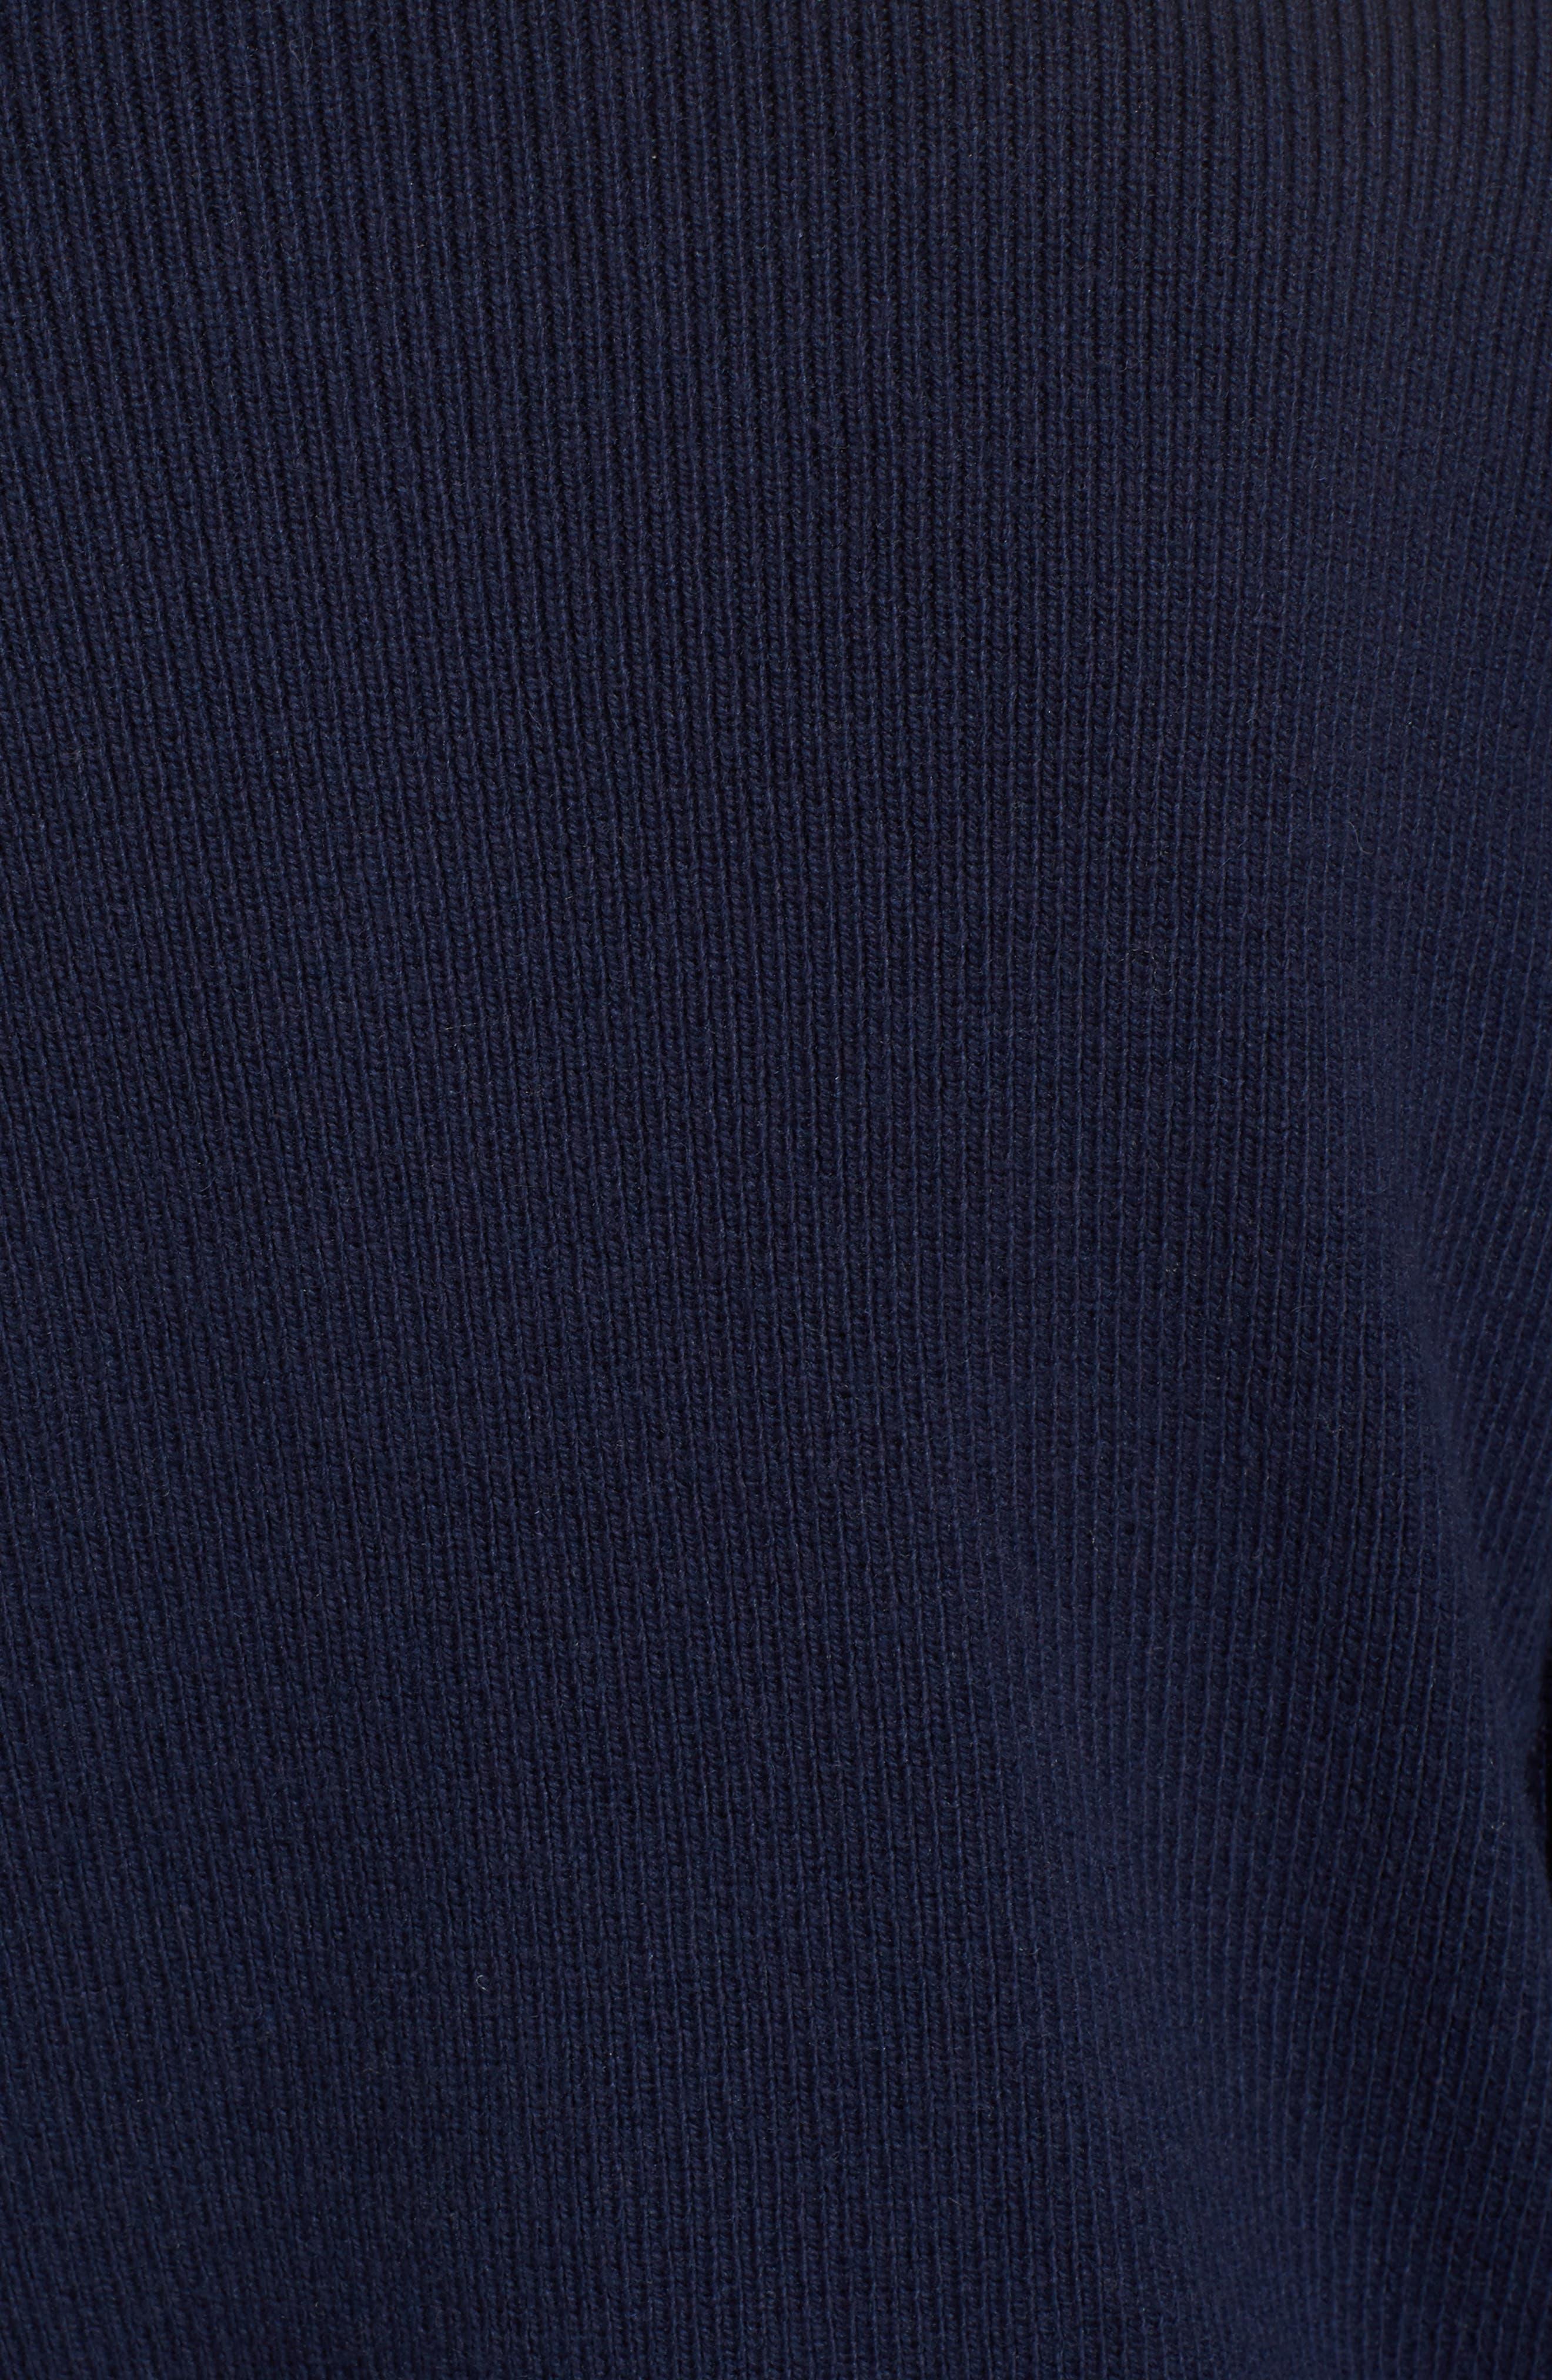 Ruffle Sleeve Sweater,                             Alternate thumbnail 19, color,